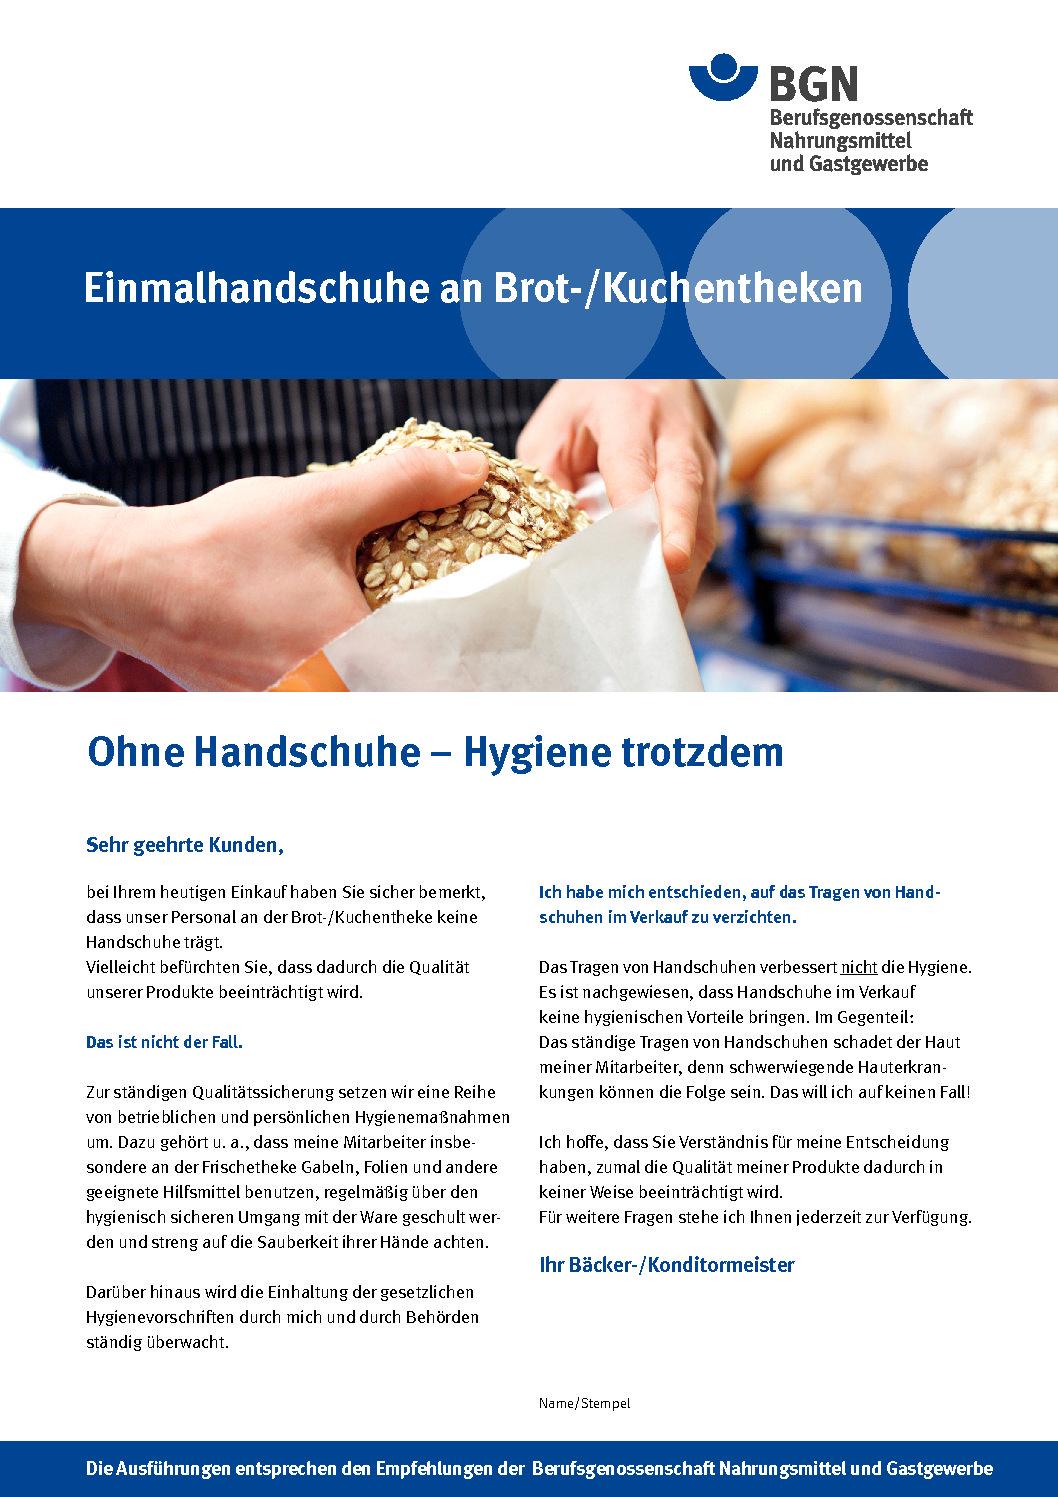 Bäckerei Hygiene